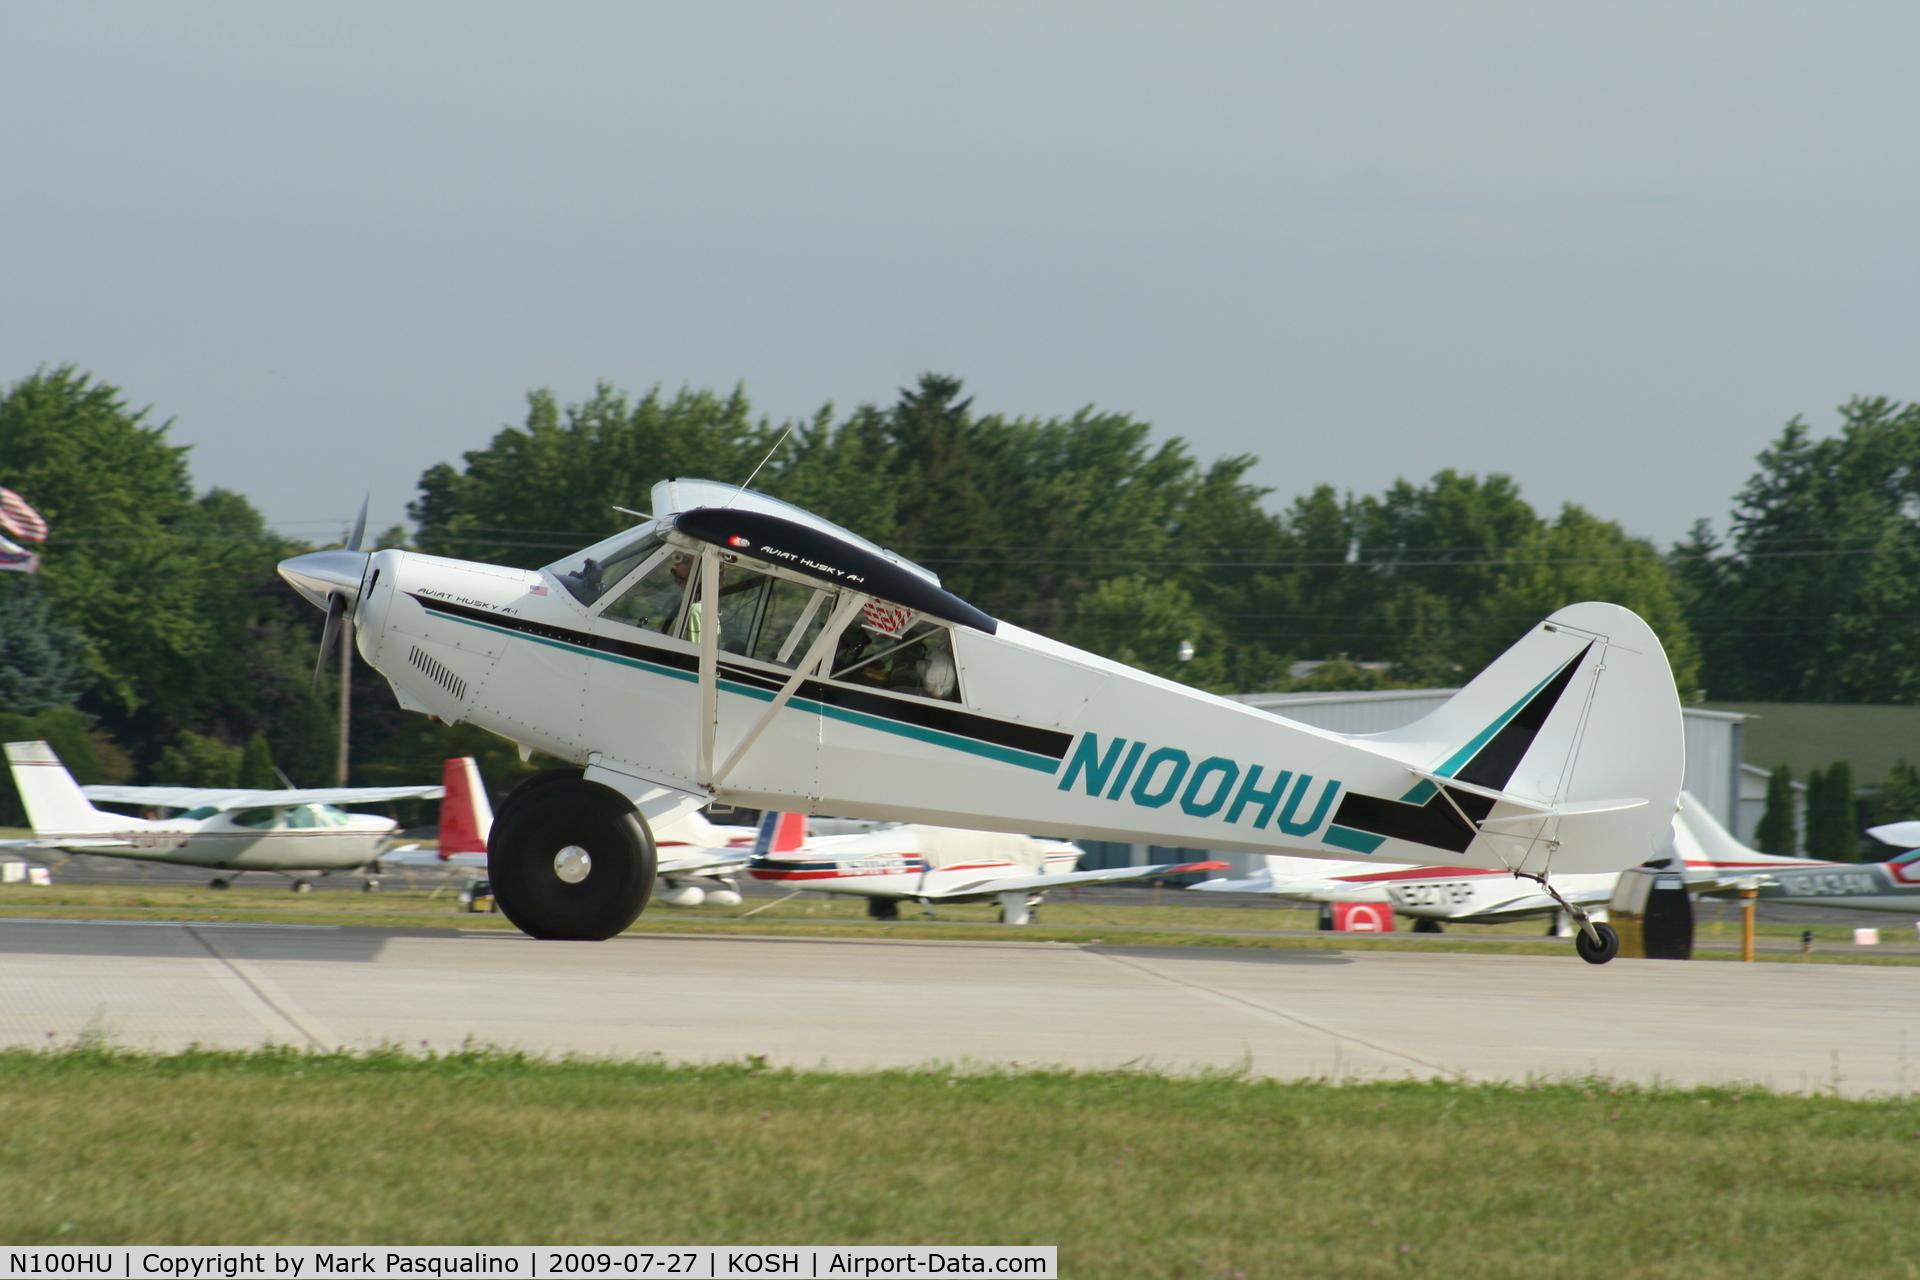 N100HU, 1996 Aviat A-1 Husky C/N 1319, Aviat A-1